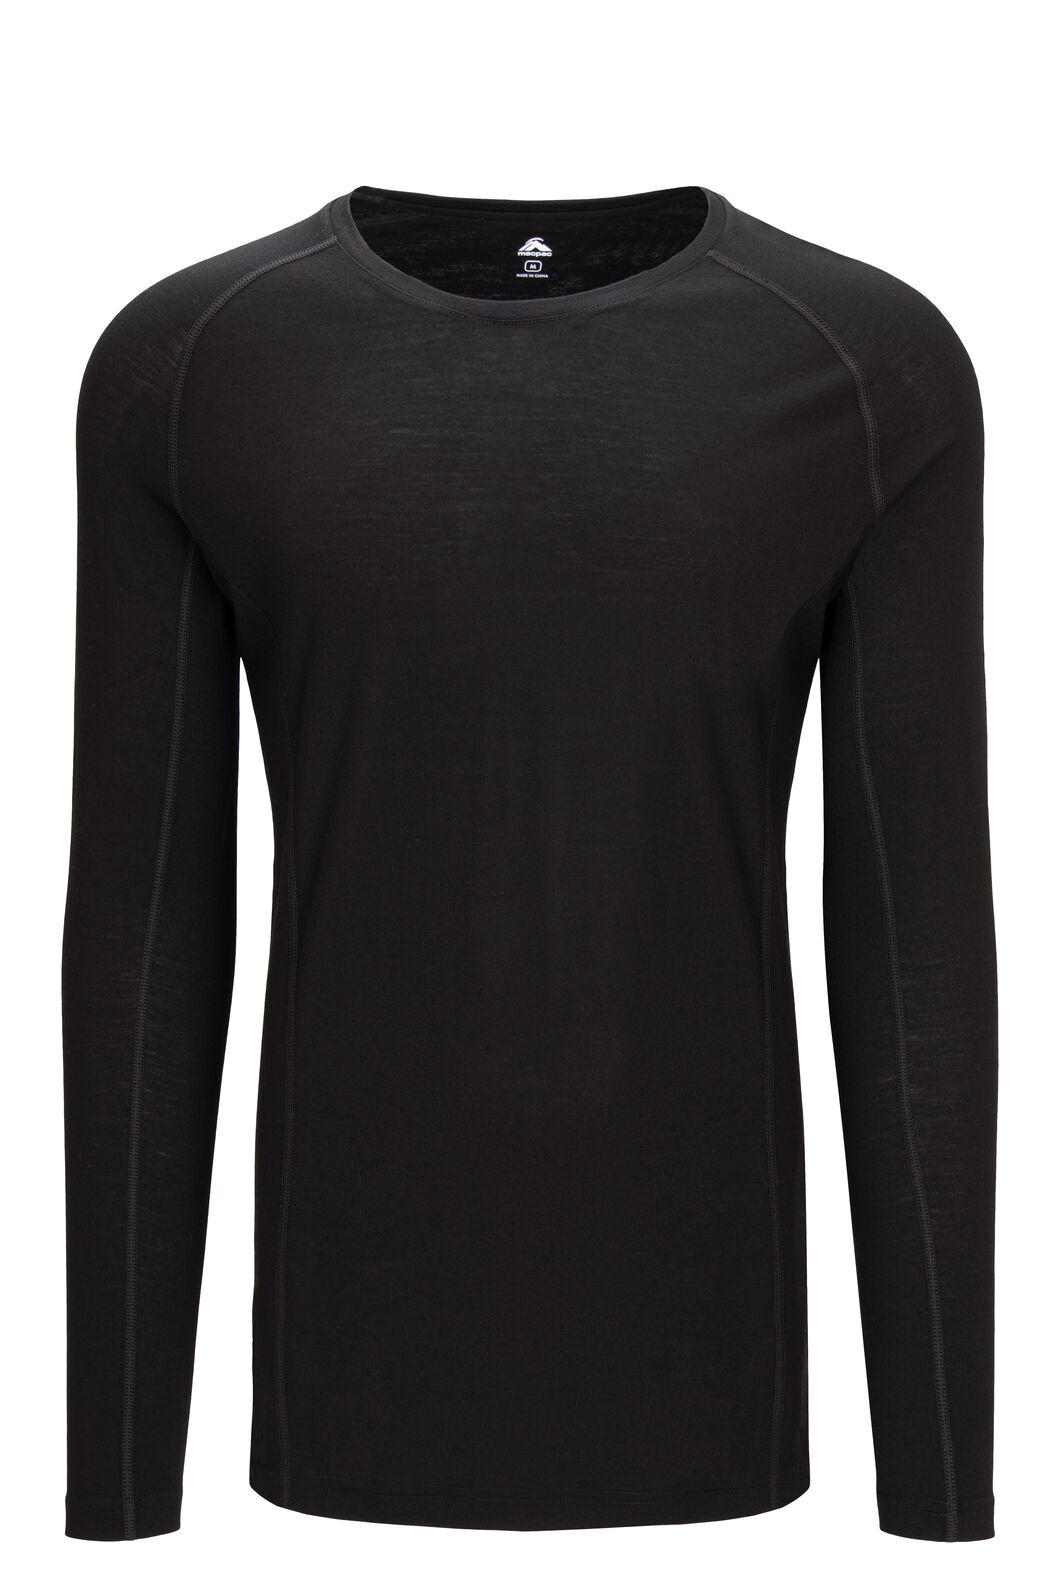 Macpac Men's 150 Merino Long Sleeve Top, Black, hi-res